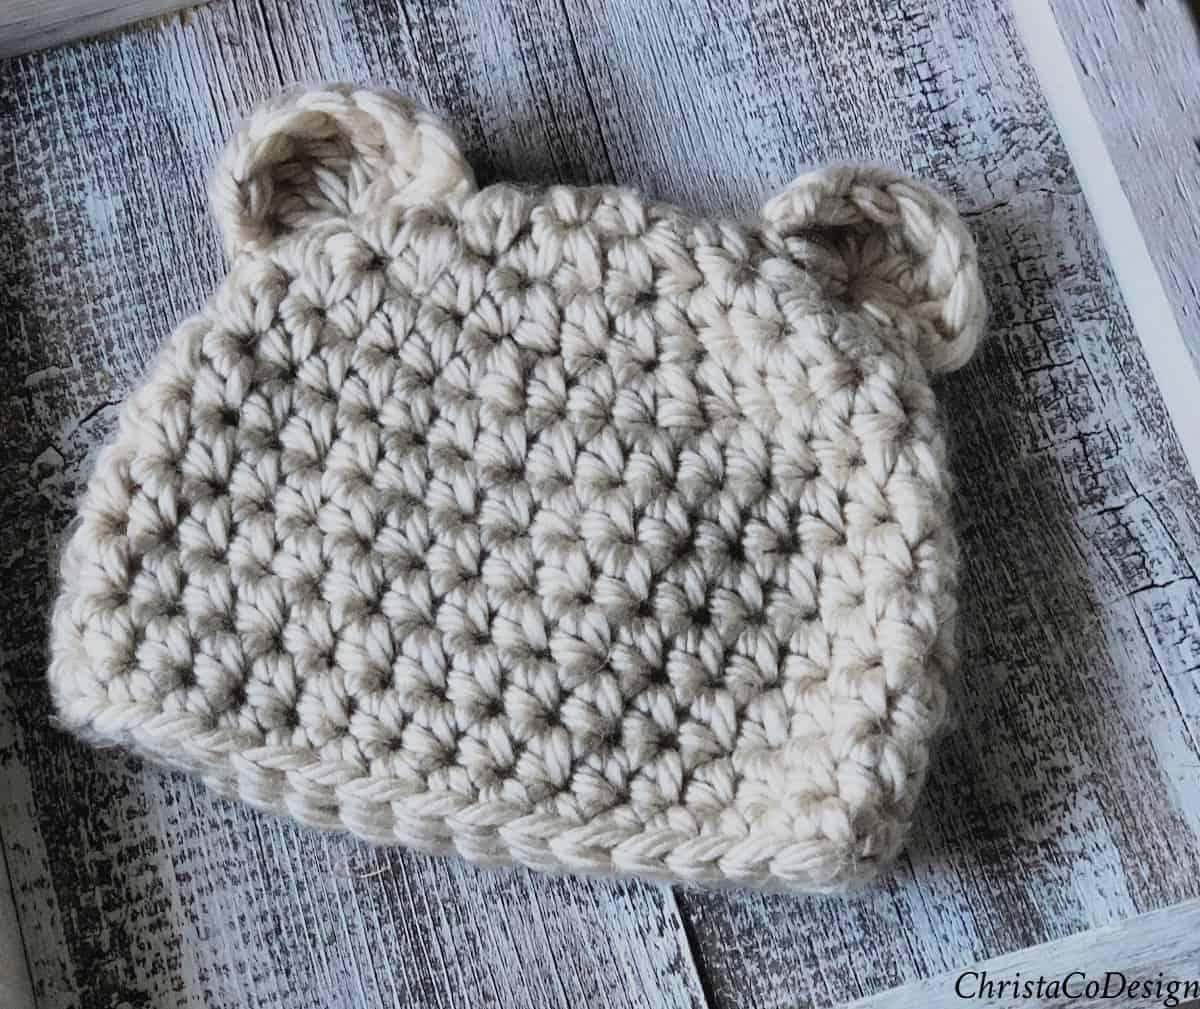 Cream colored crochet bear beanie with ears.